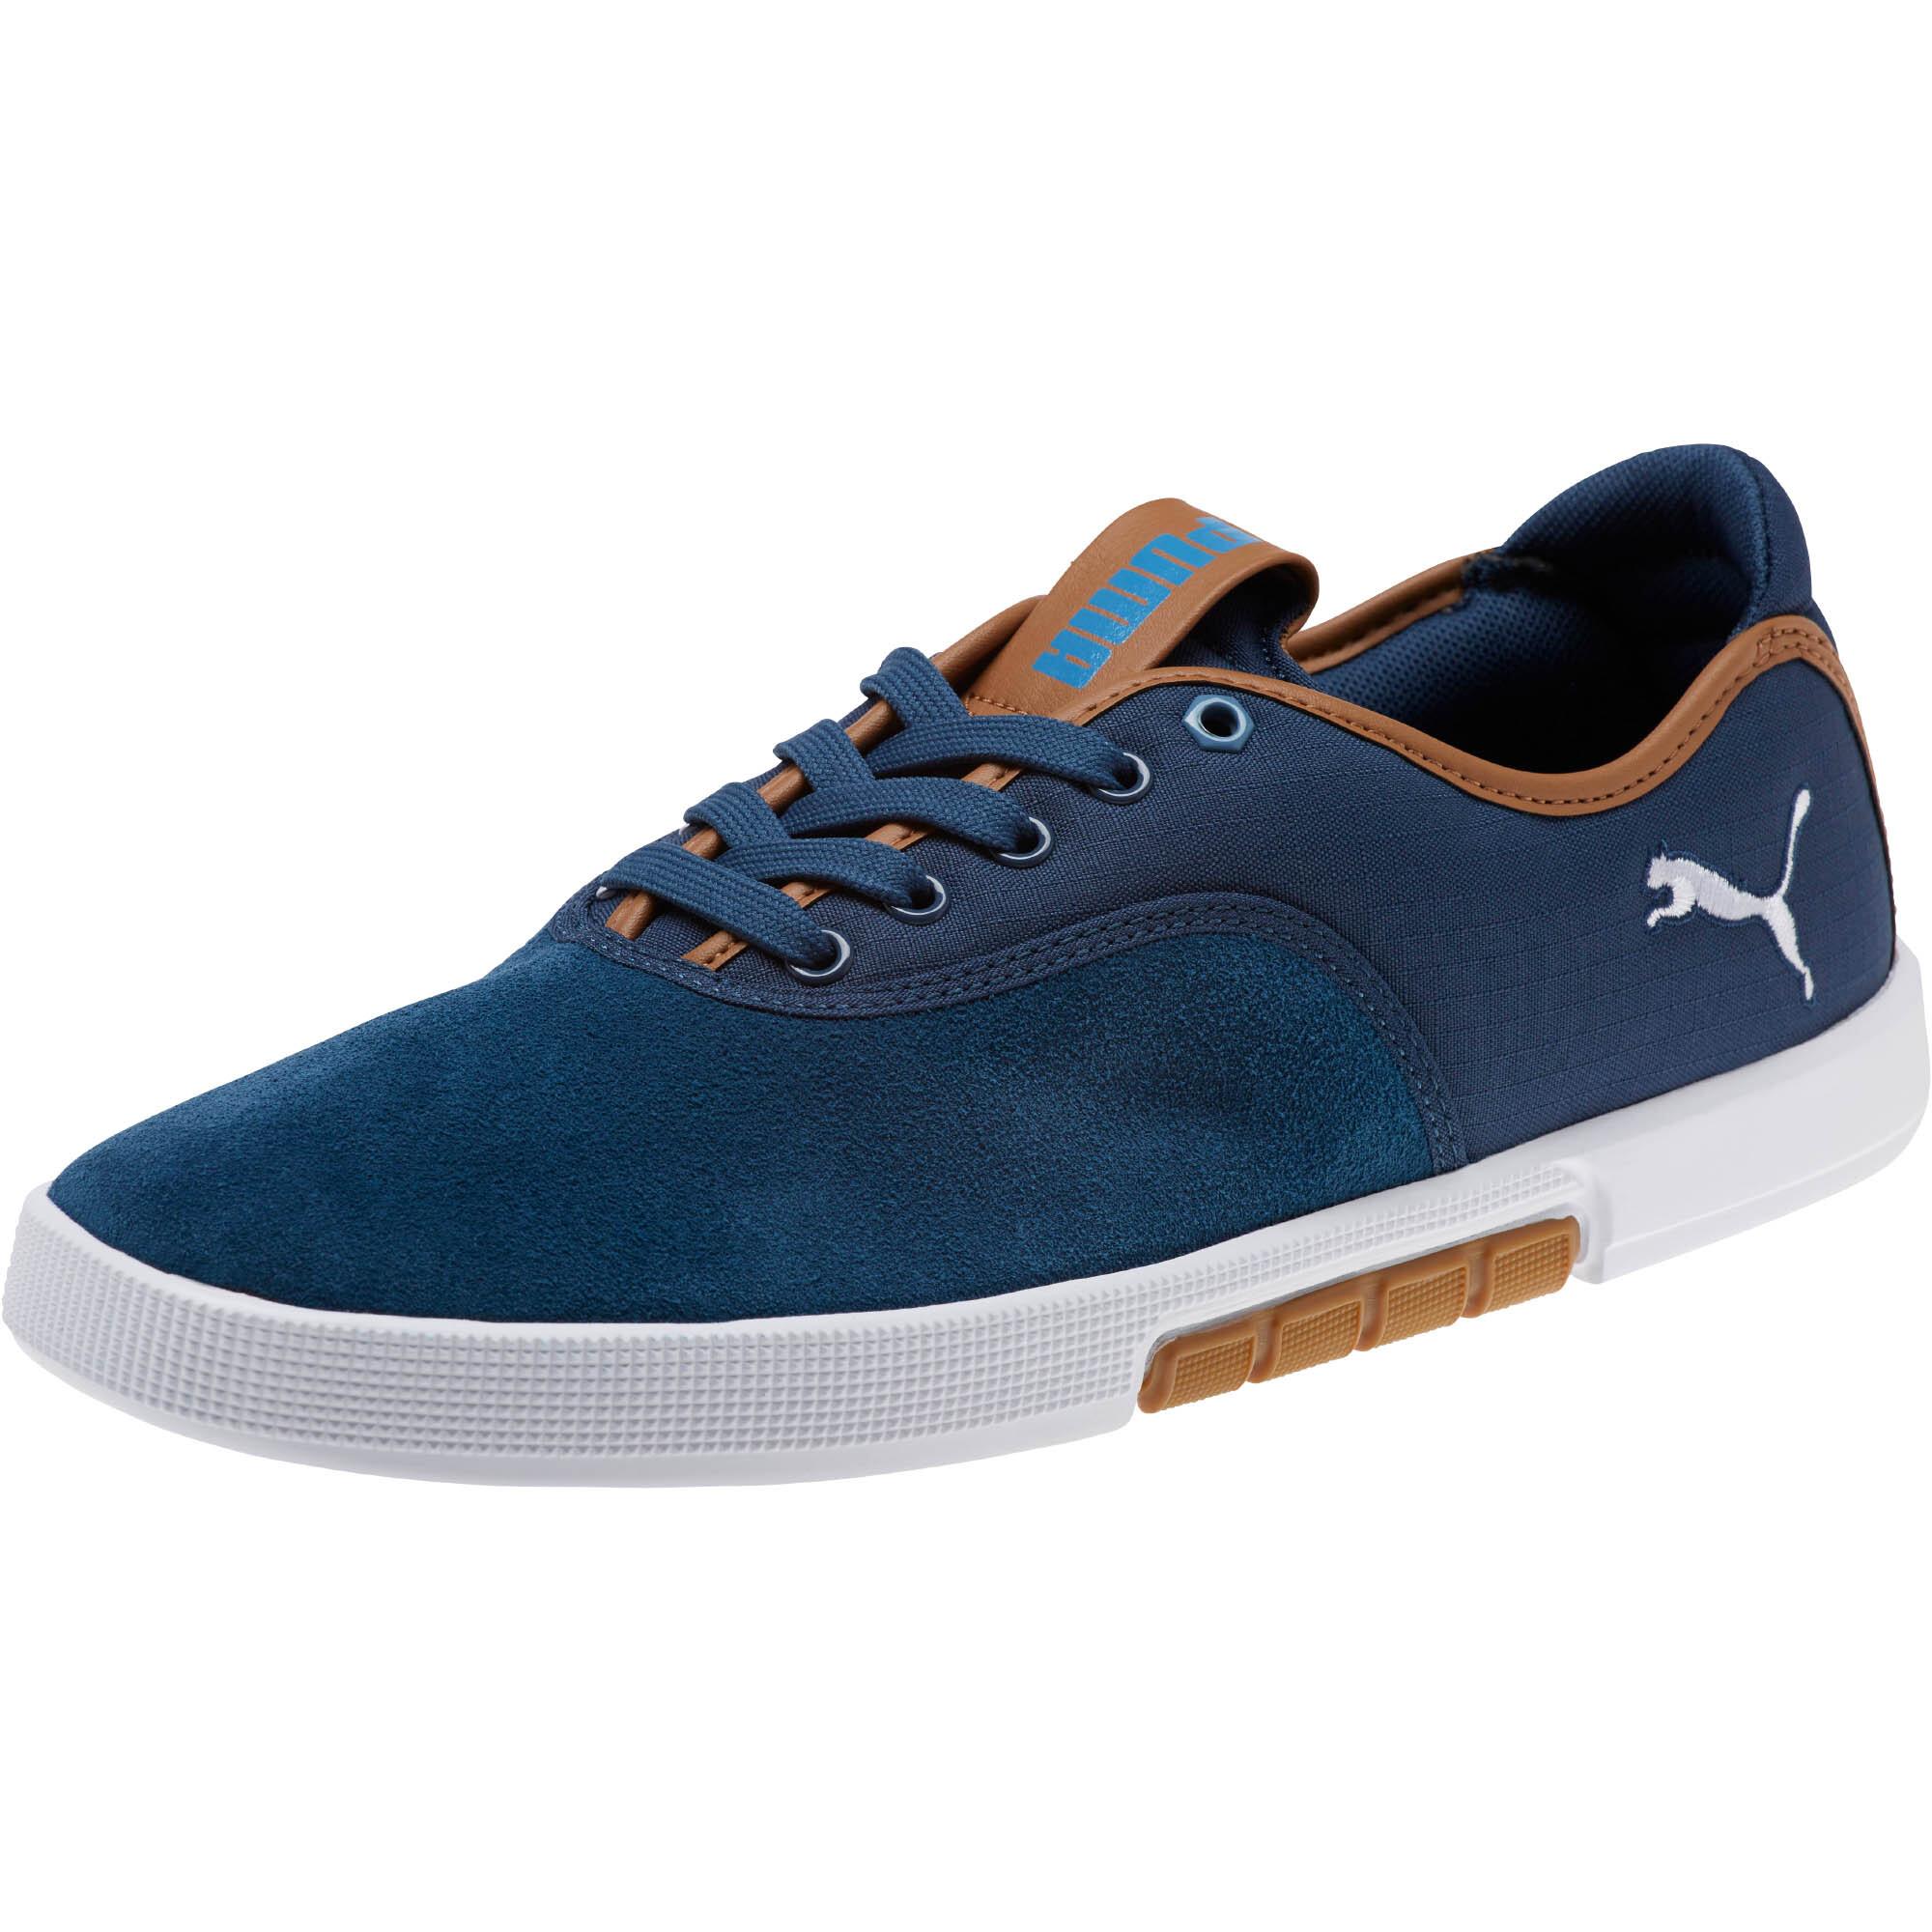 PUMA-Funist-Lo-MU-Men-039-s-Sneakers-Men-Shoe-Evolution thumbnail 16